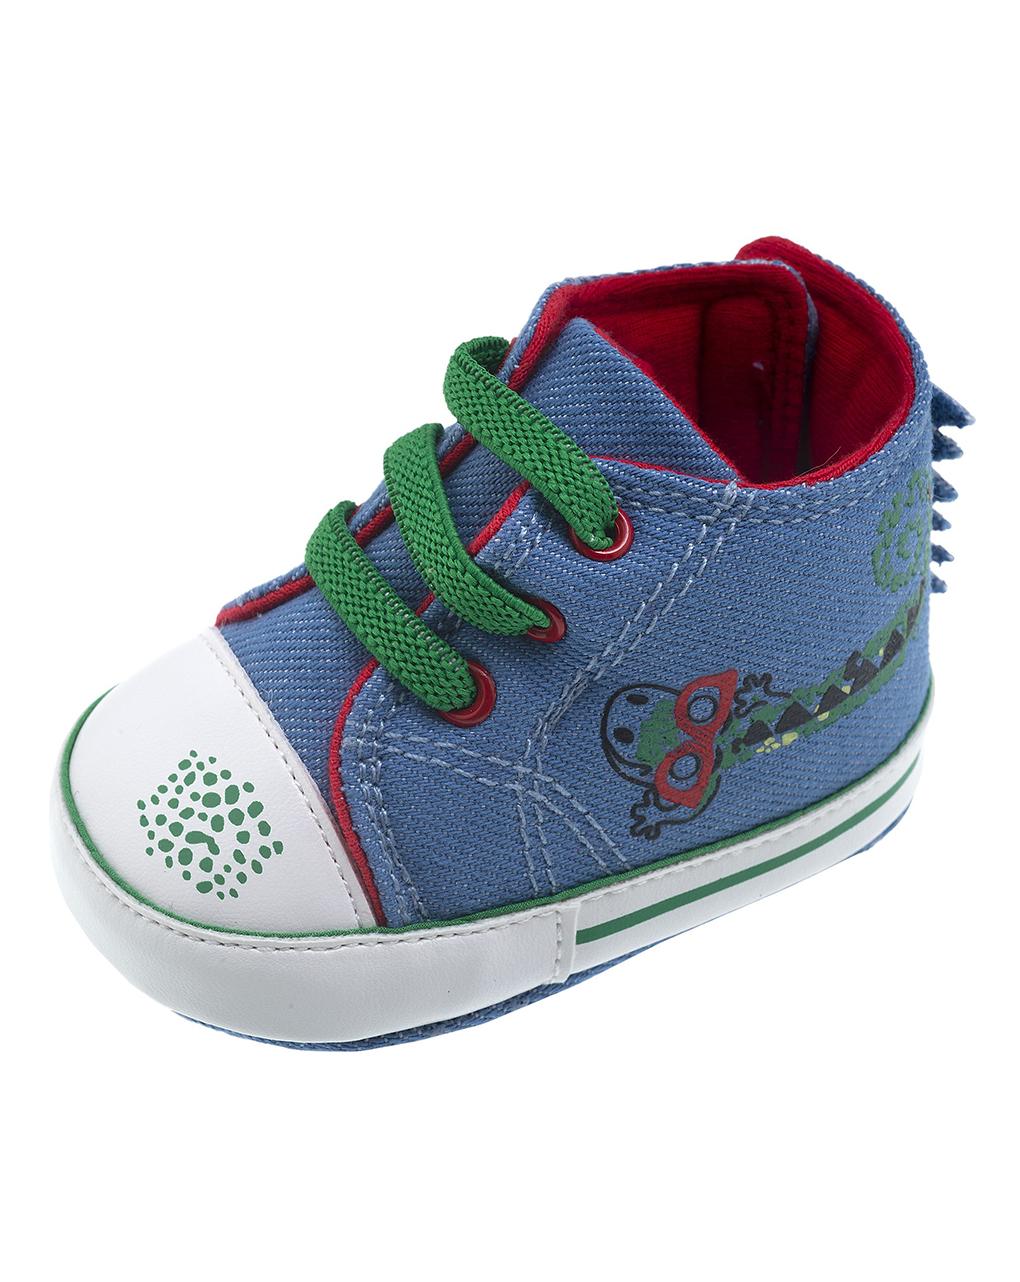 Sneaker maschio noras - Chicco